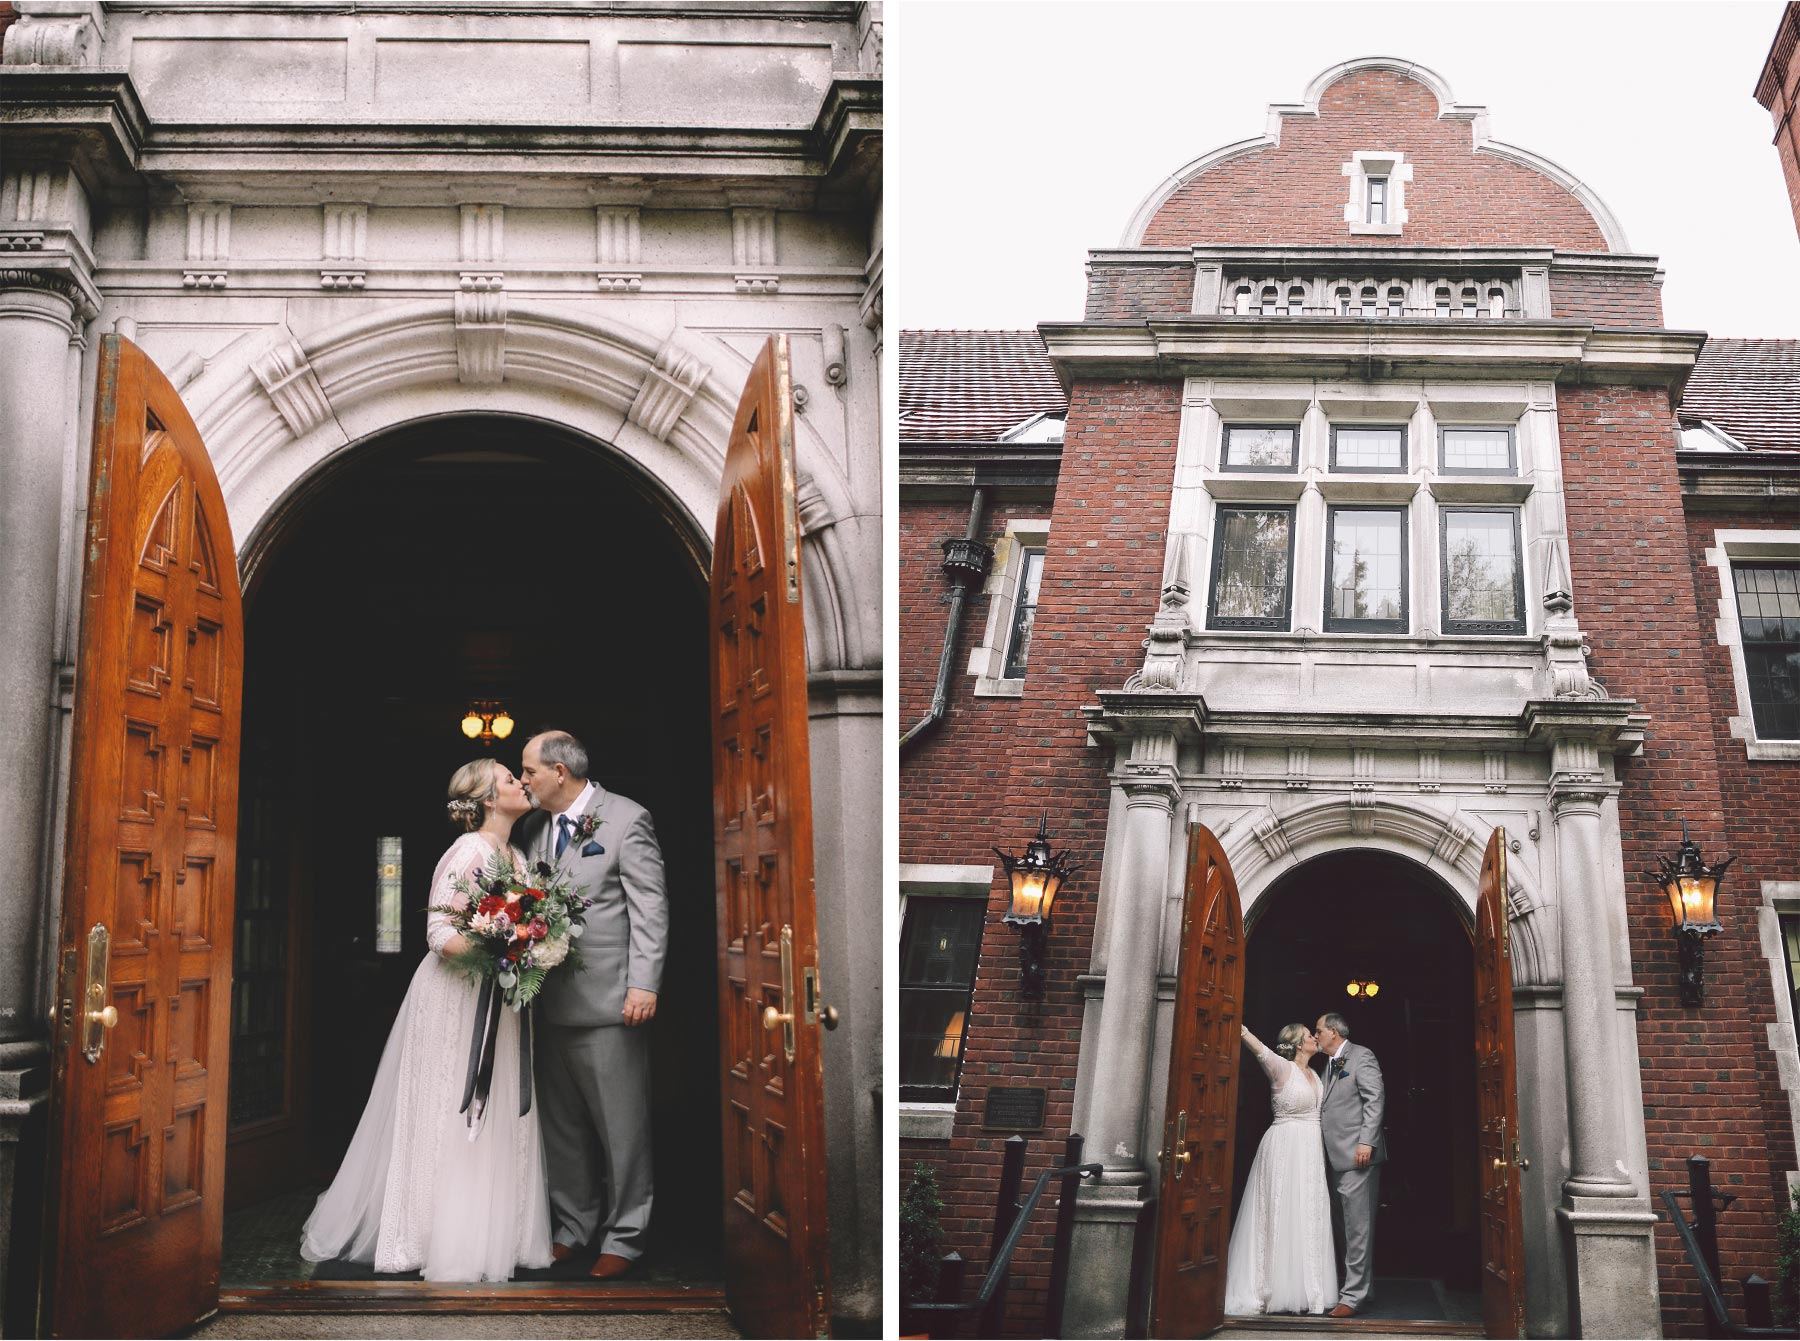 08-Duluth-Minnesota-Wedding-Photography-by-Vick-Photography-Glensheen-Mansion-Kelli-and-Marc.jpg